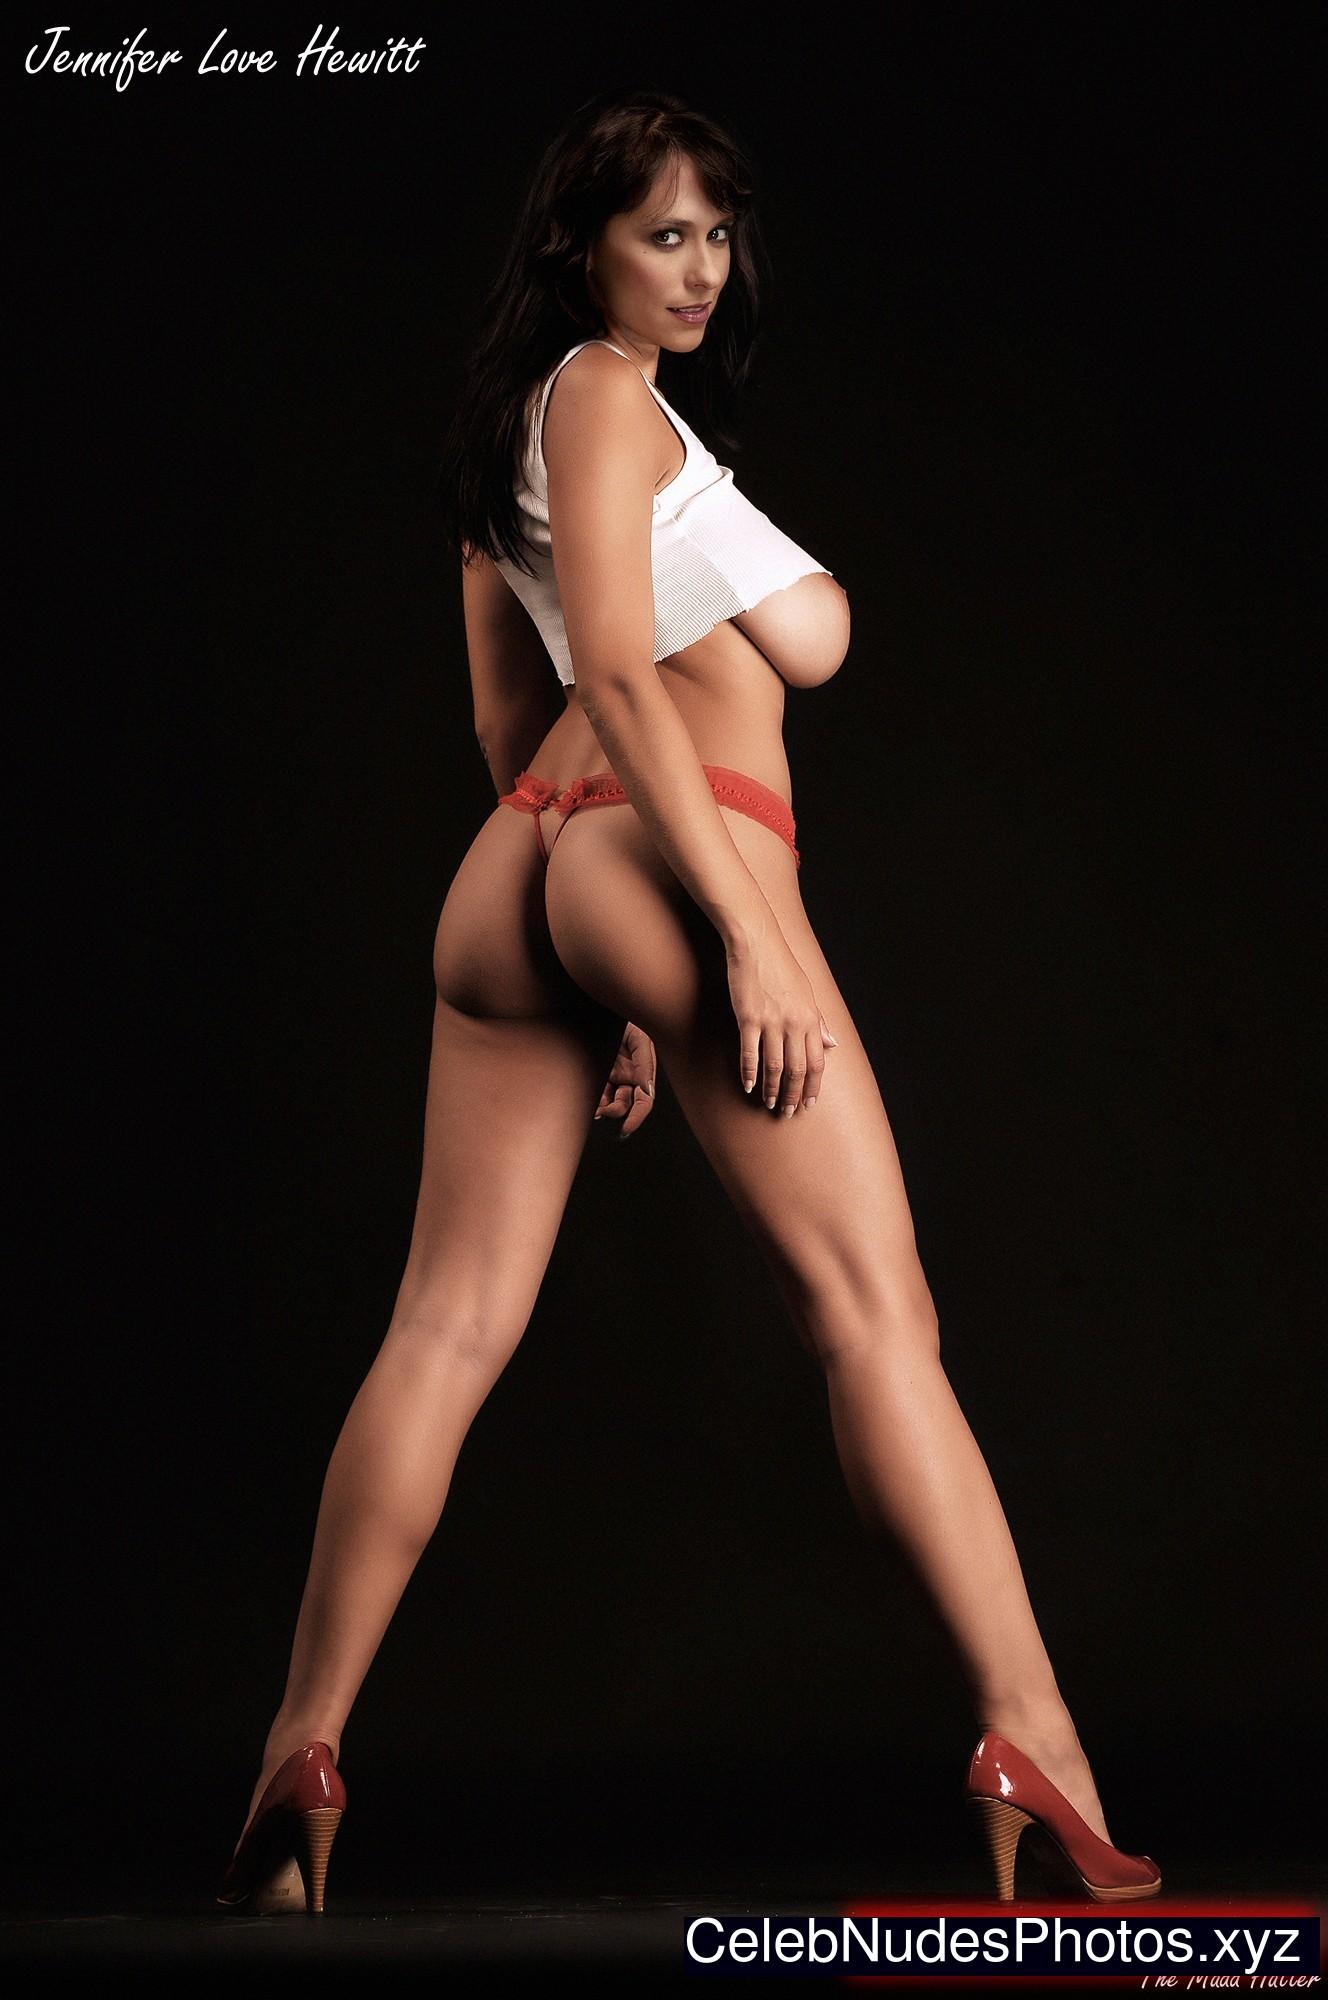 Jennifer Love Hewitt Celeb Nude sexy 7